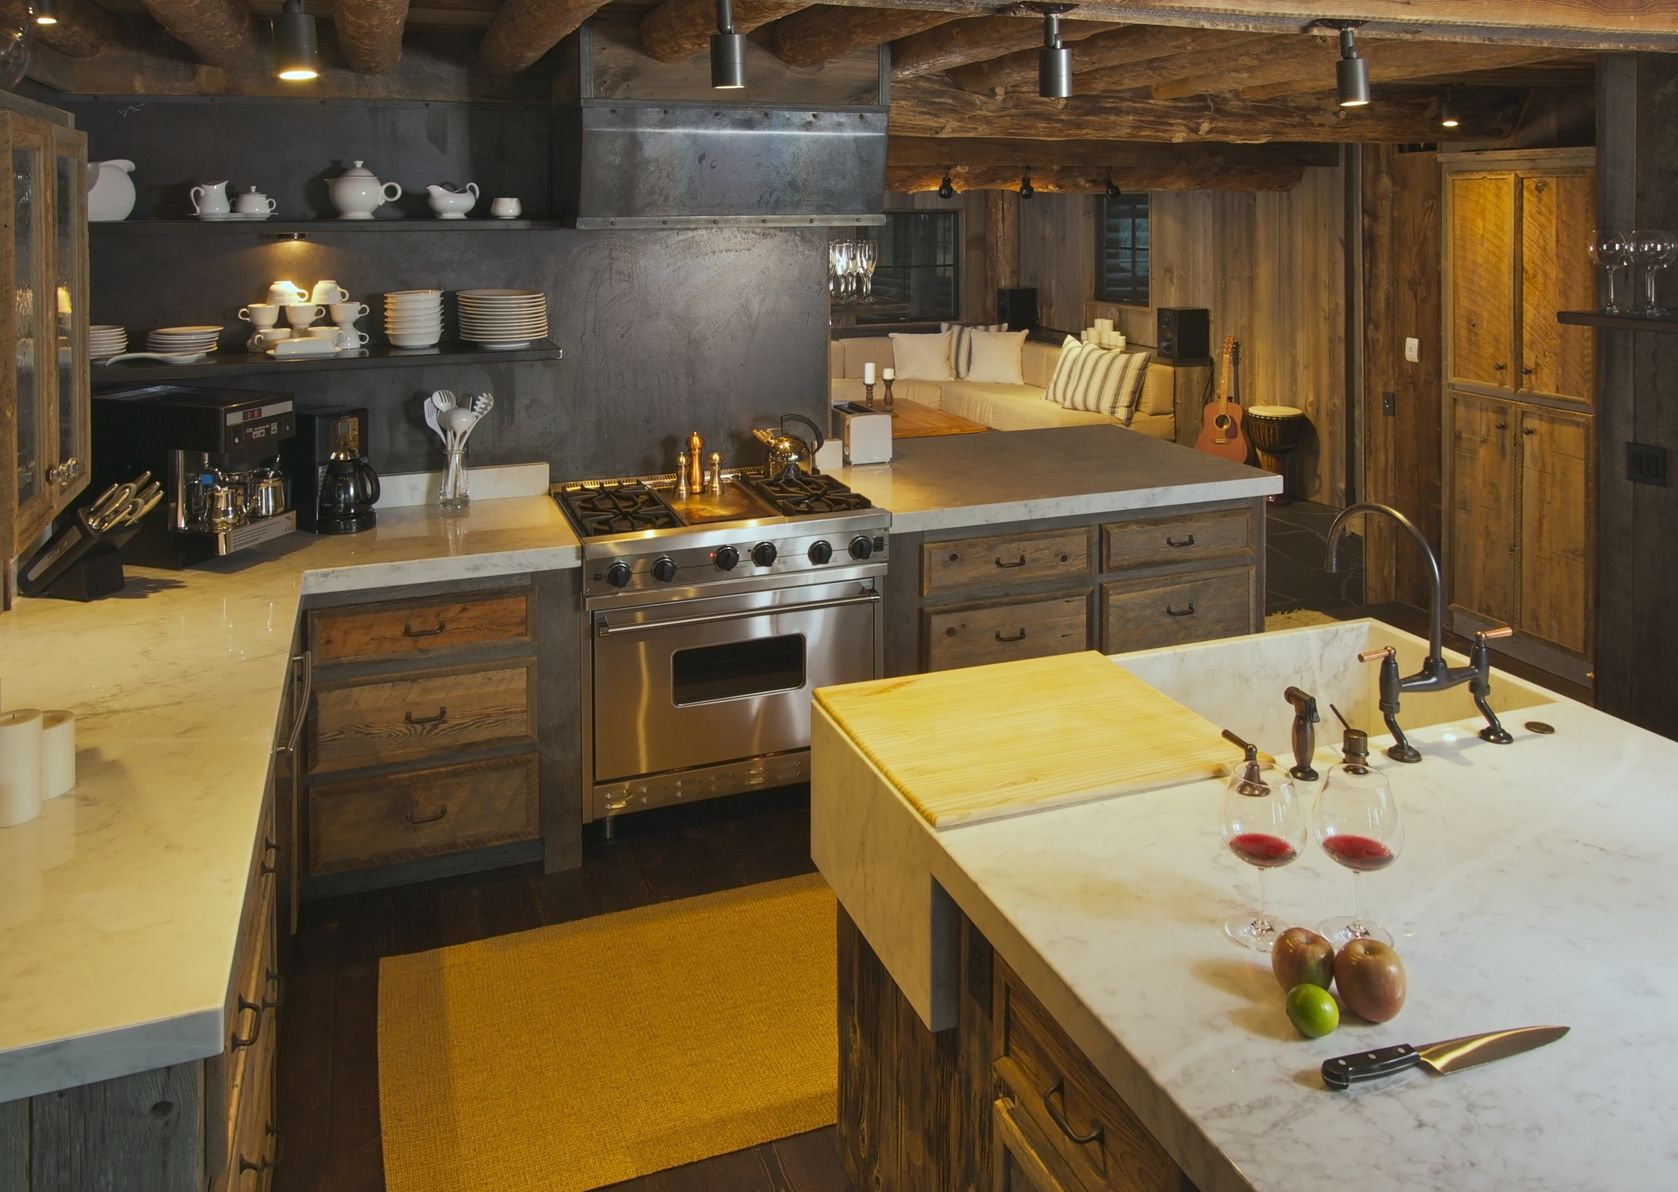 kitchen cabinets san diego. Custom Cabinet of San Diego Portfolio Log Home Kitchen Cabinets Awesome Innovative Design